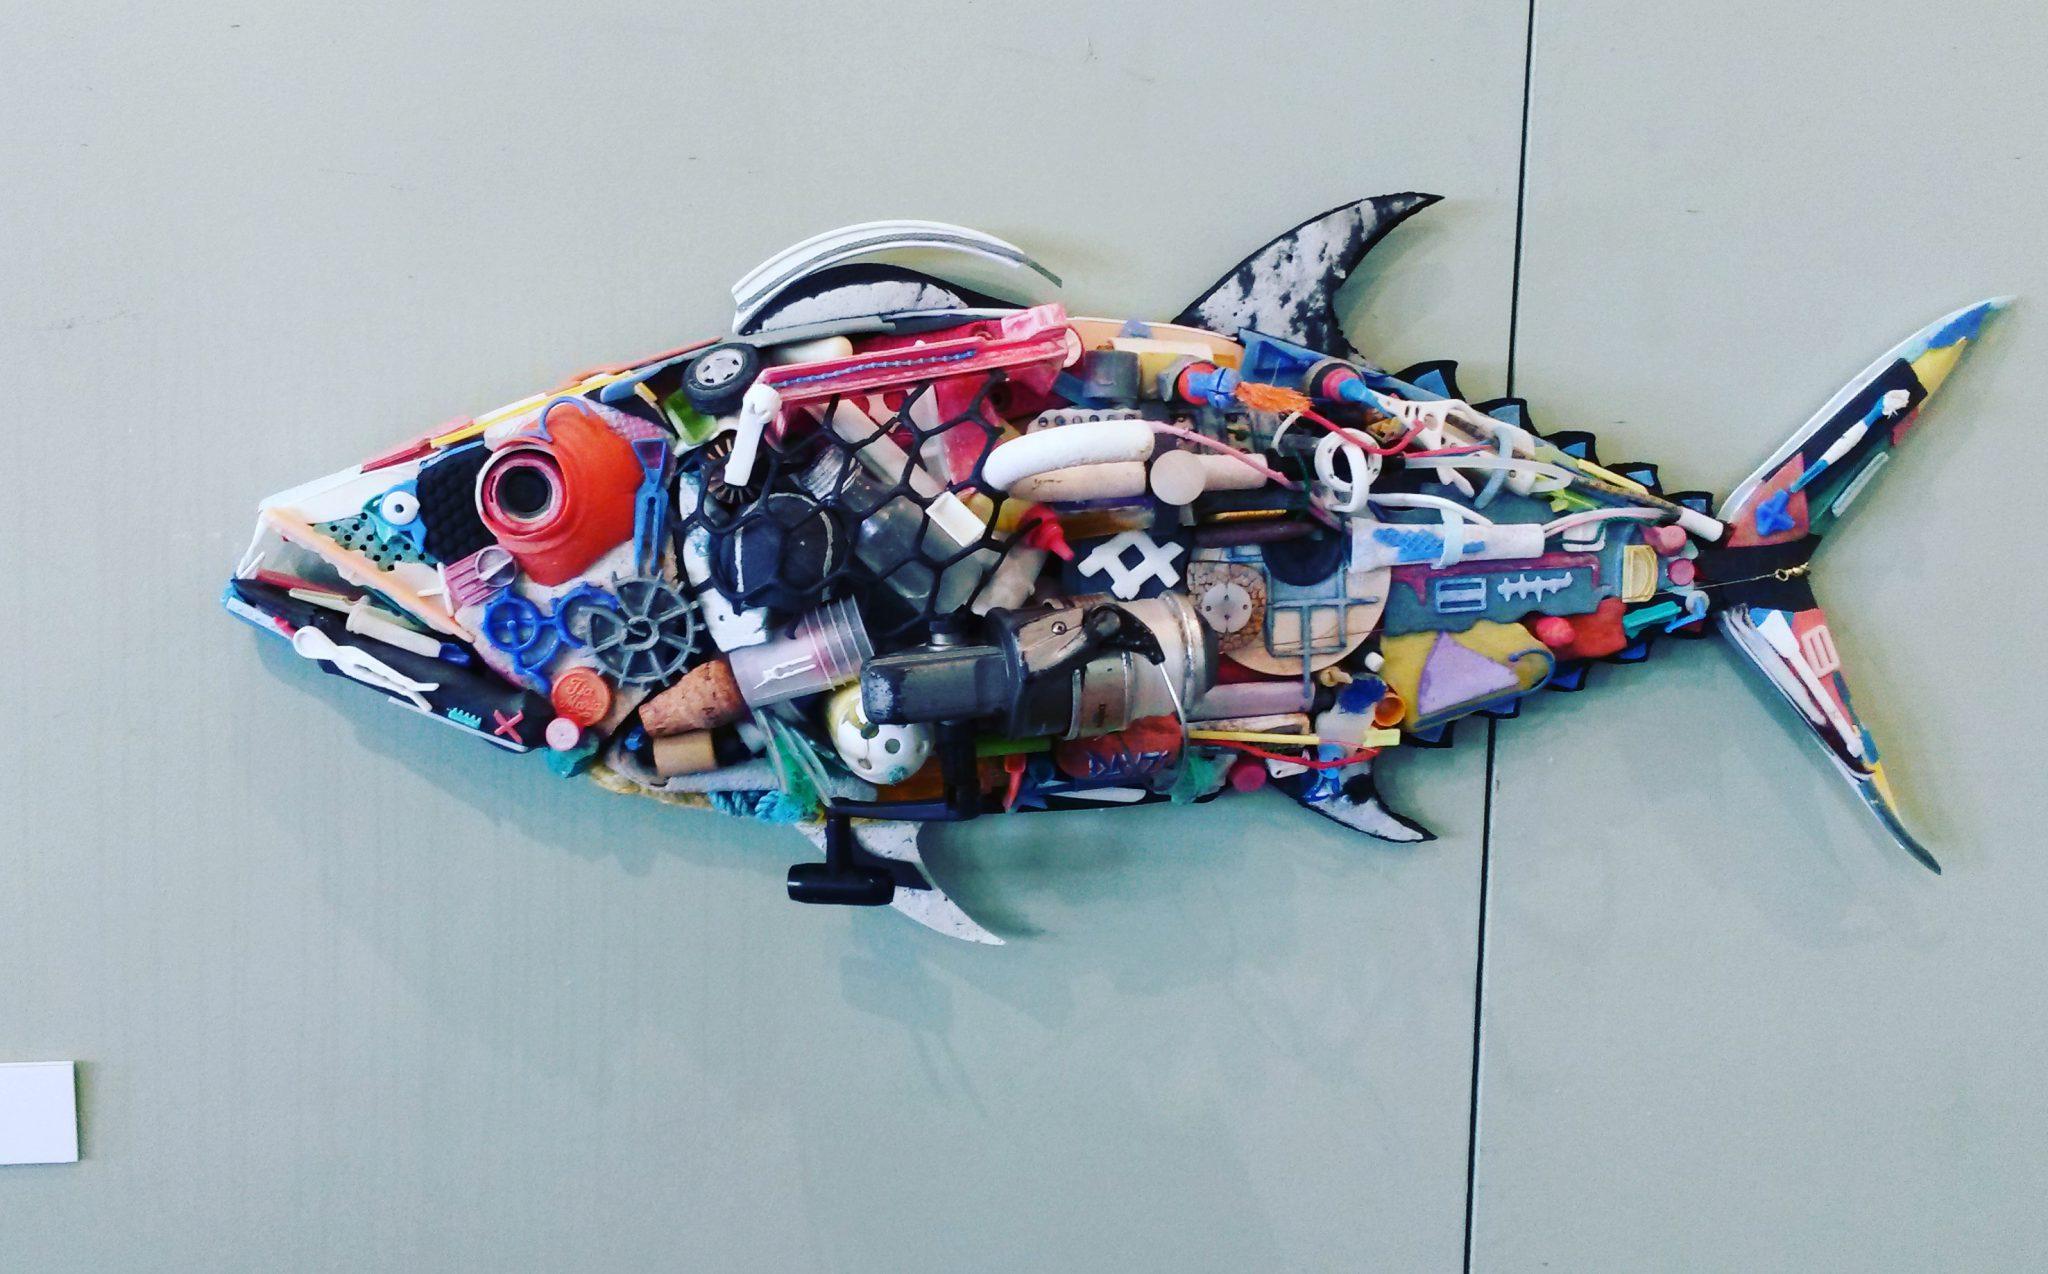 Trash to treasure by David Day